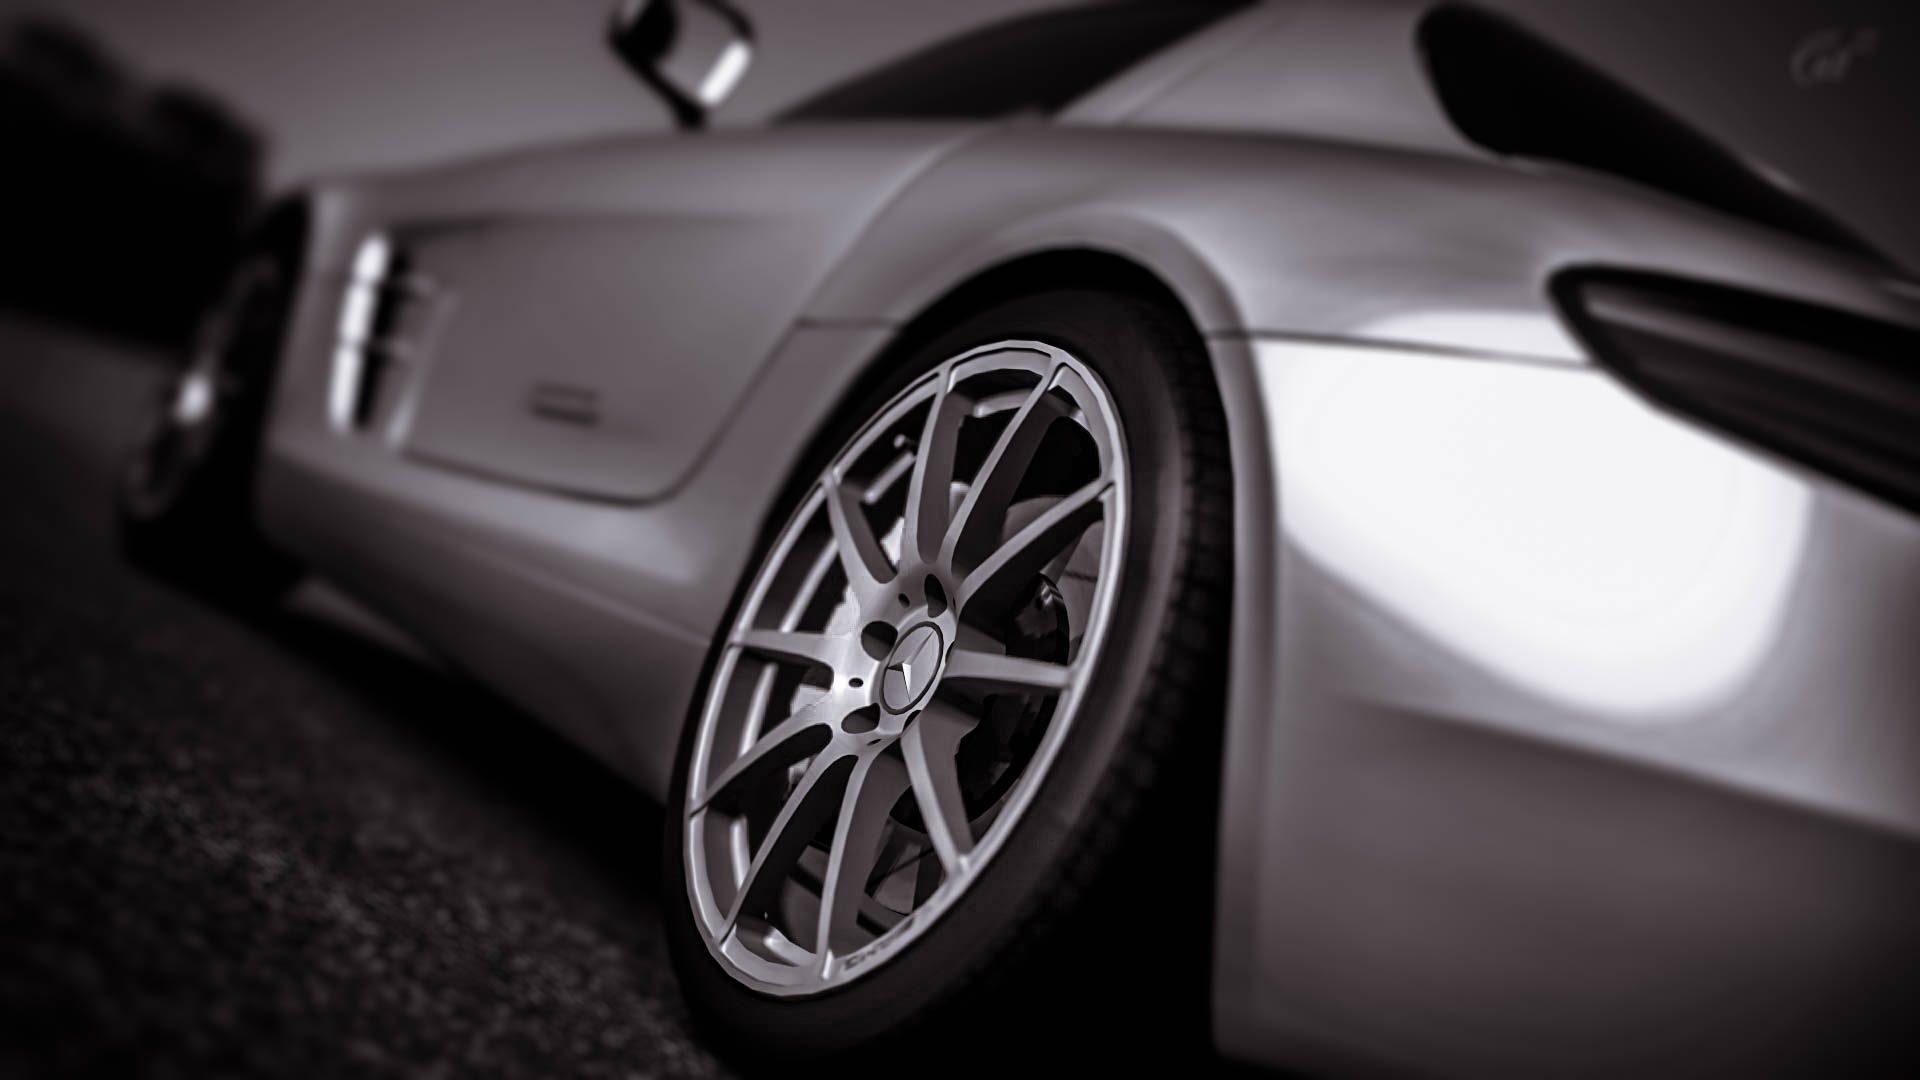 Mercedes_SLS_AMG_04.jpg